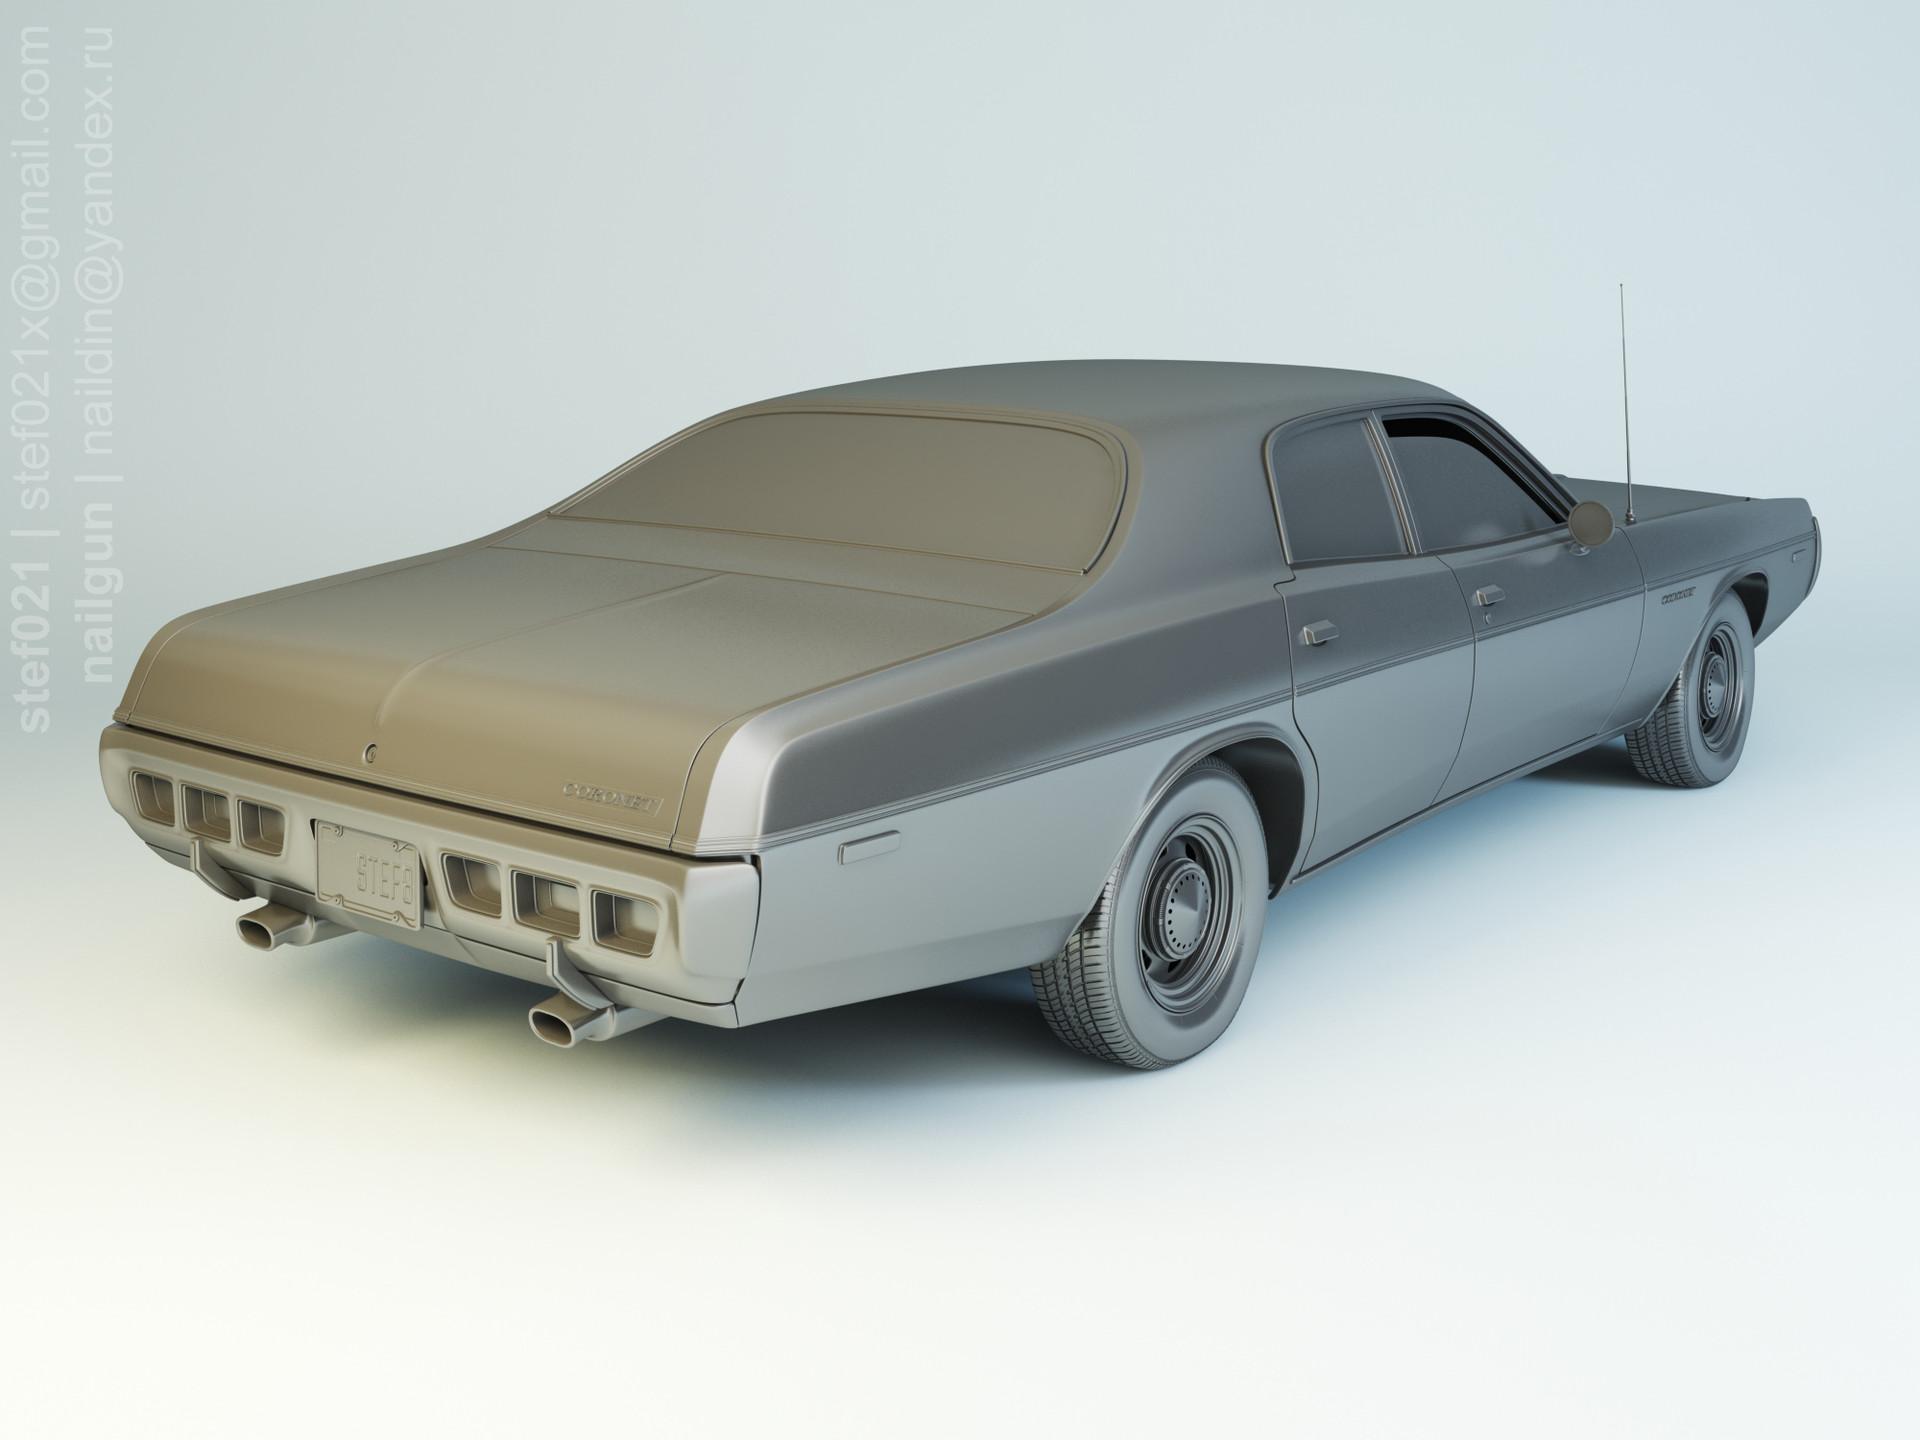 Nail khusnutdinov pwc 053 001 dodge coronet 1973 modelling 1